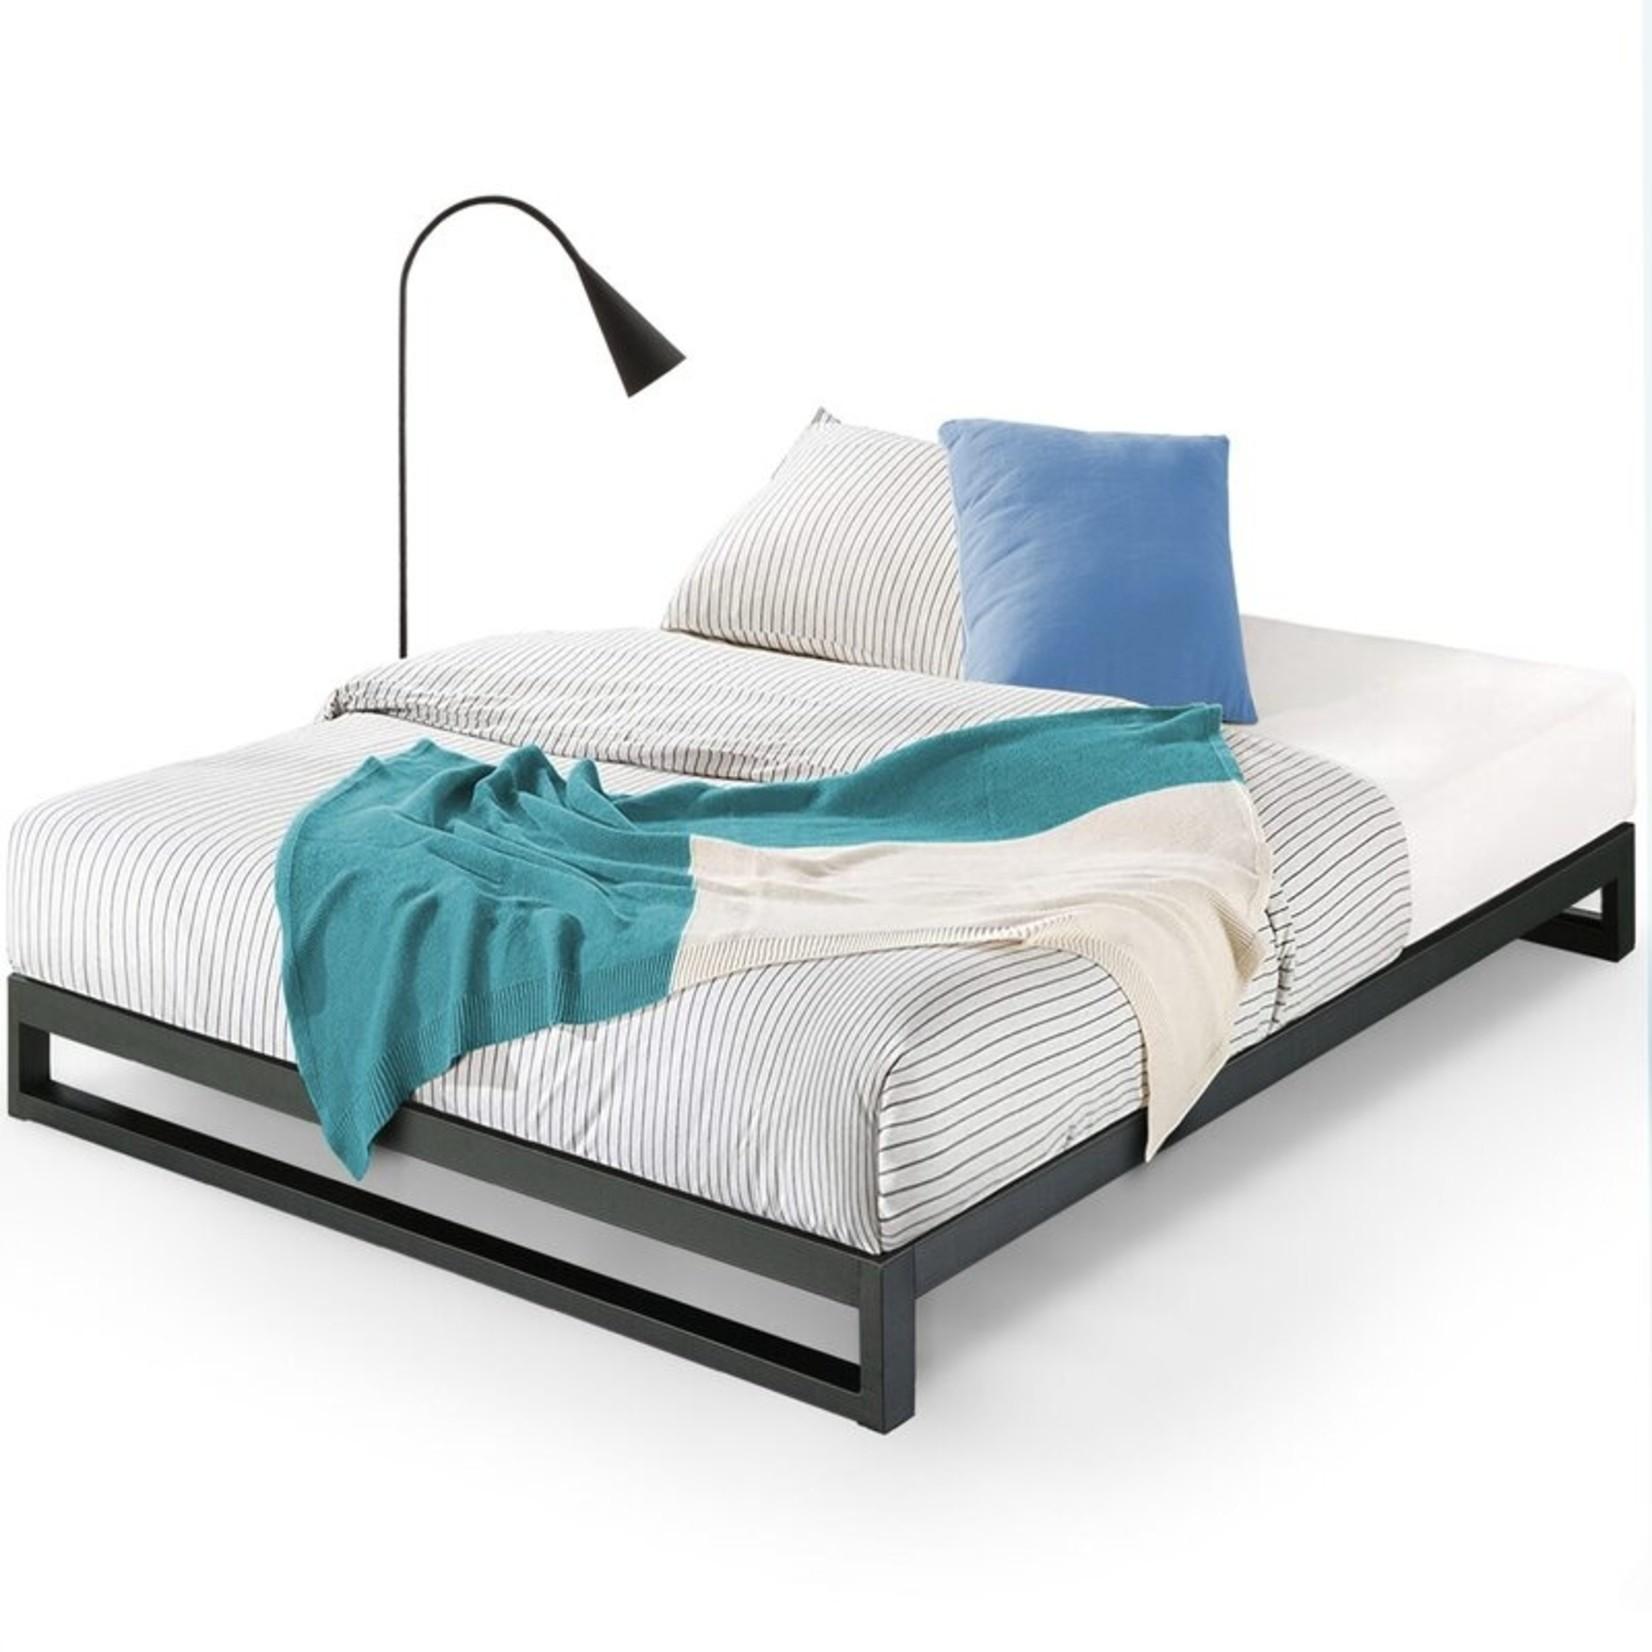 *Full - Hanley Heavy Duty Bed